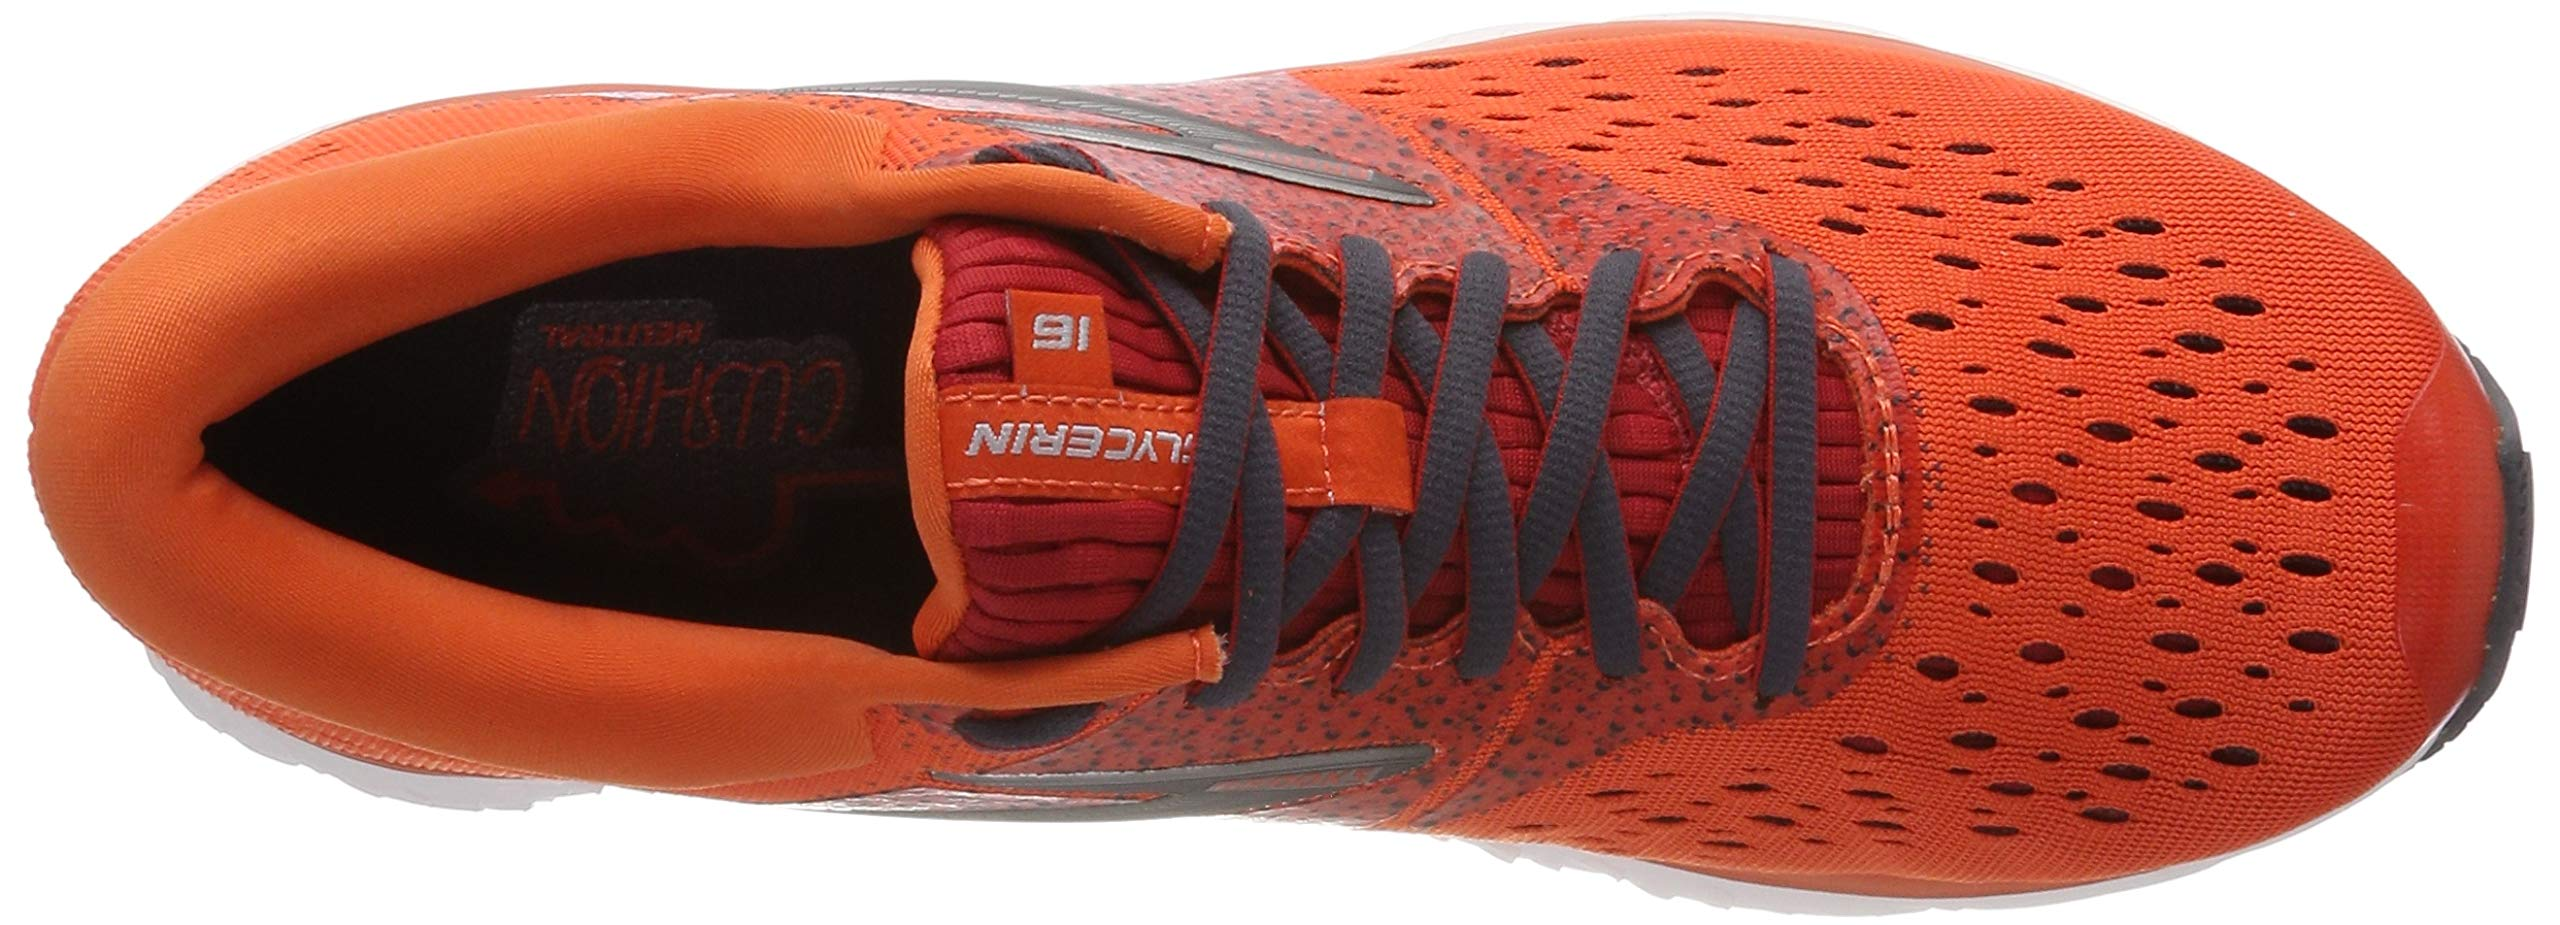 810TLvDbM3L - Brooks Men's Glycerin 16 Running Shoes